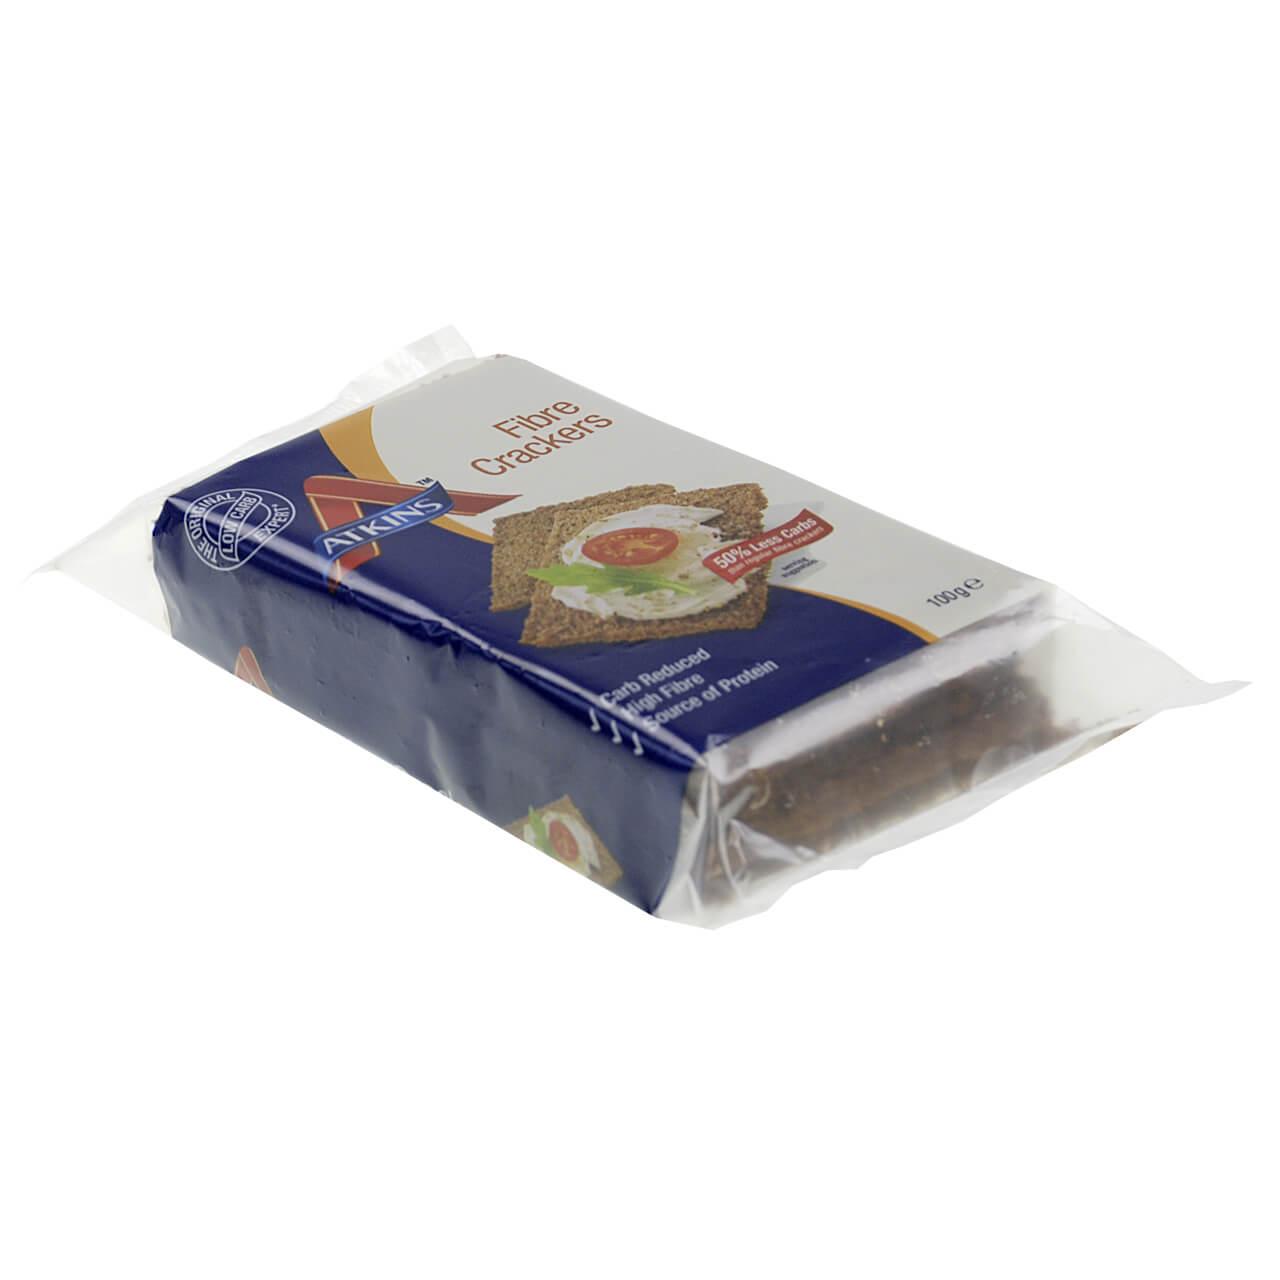 "Atkins Knäckebrot ""Fibre Crackers"" 100 g, Atkins Knäckebrot kaufen, Atkins Knäckebrot online bestellen im Shop"